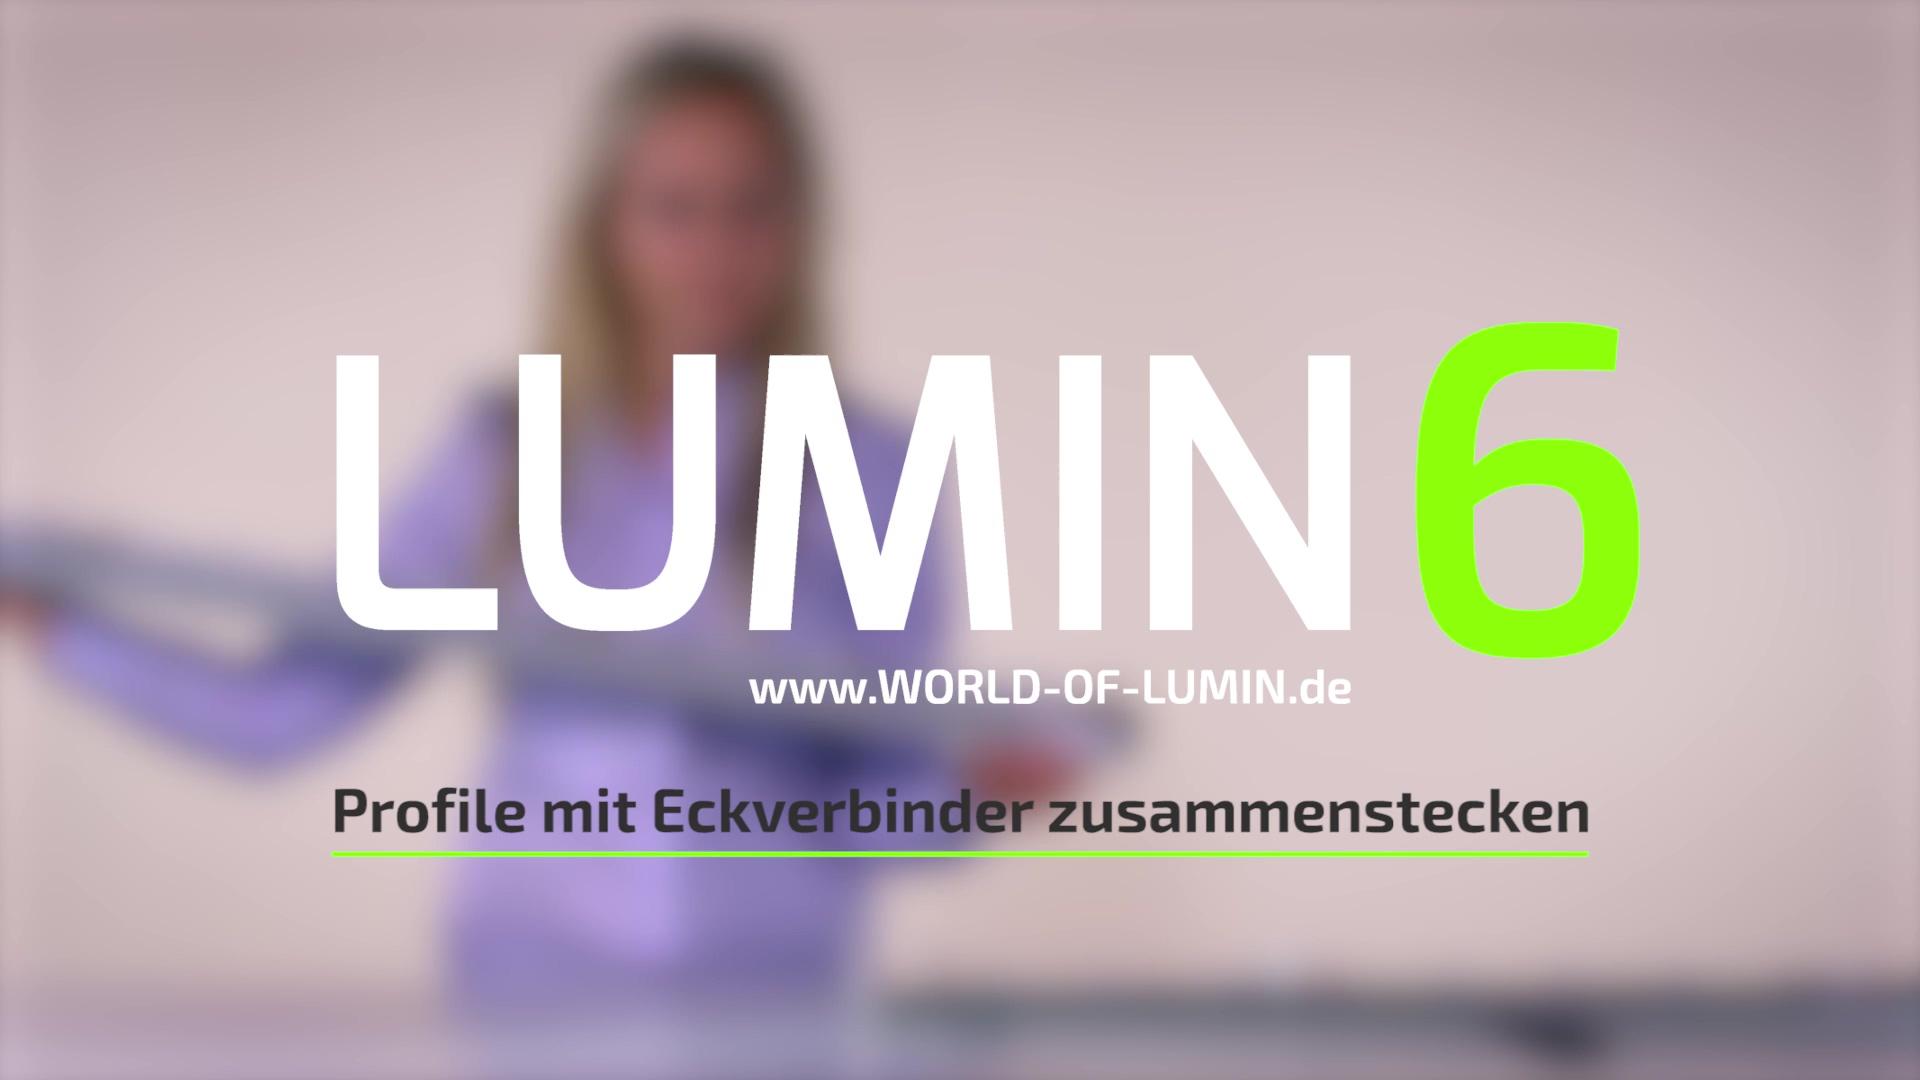 LaConcept_Lumin6_QR_Eckverbinder